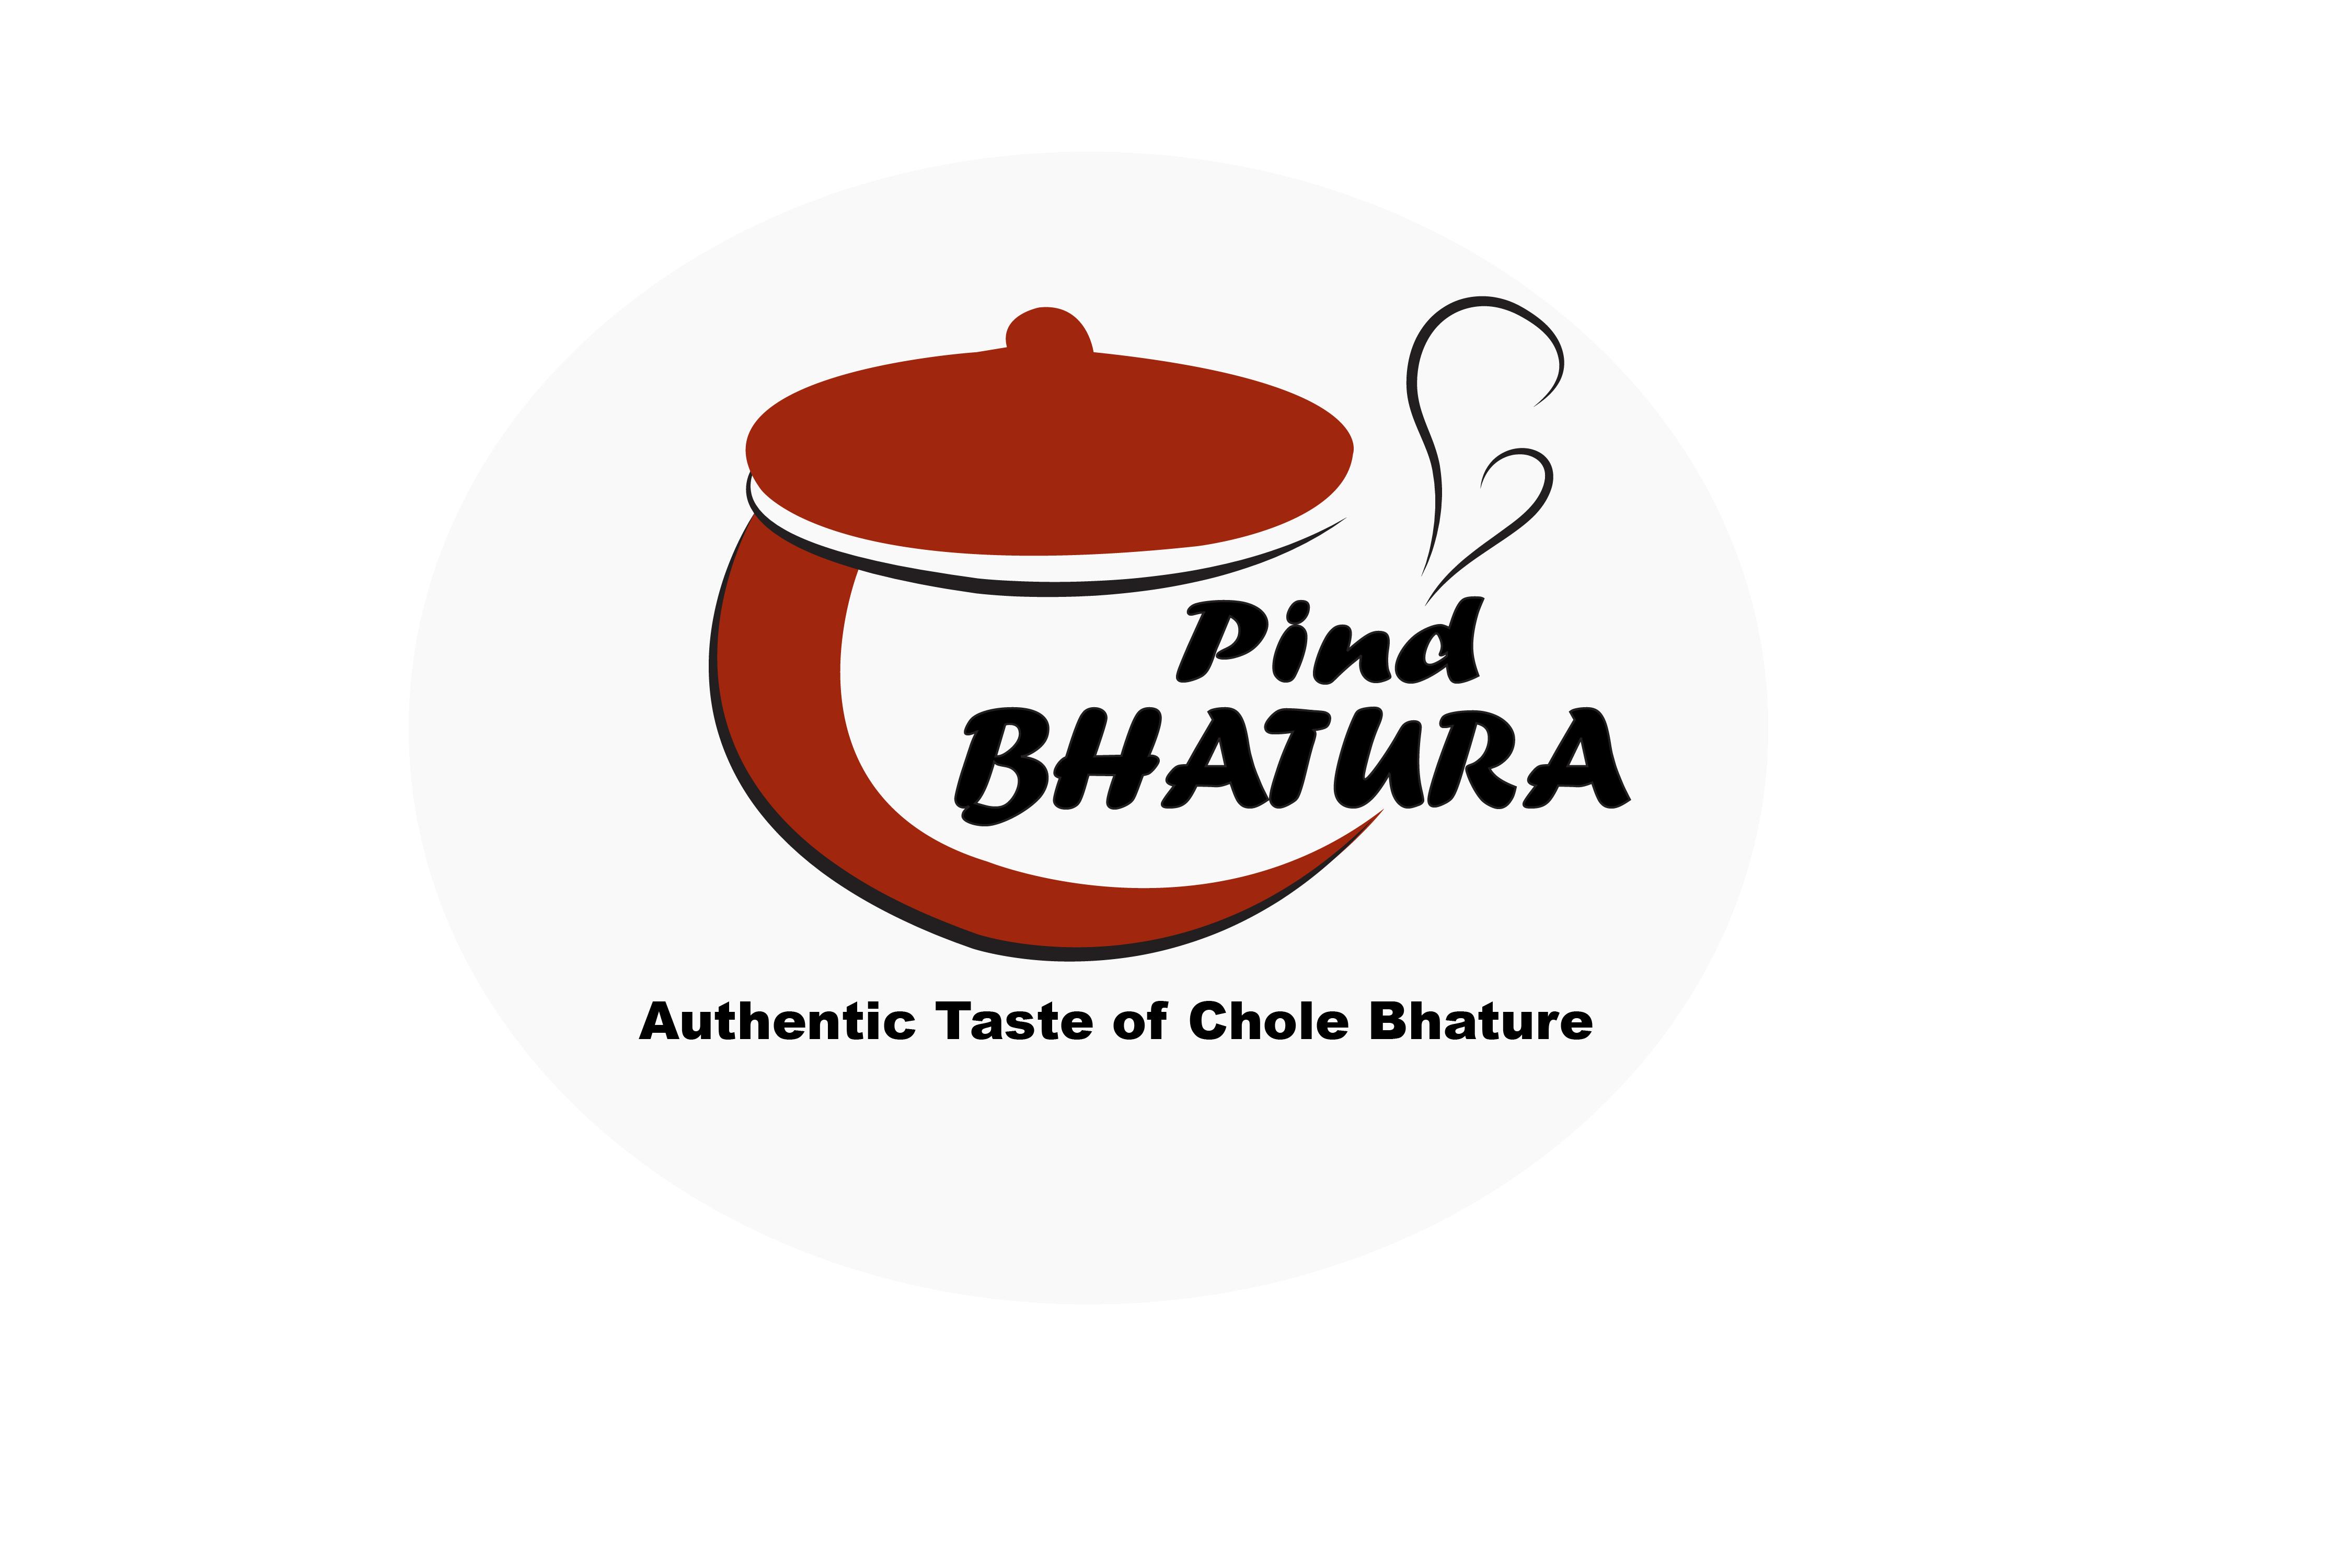 Pind Bhatura